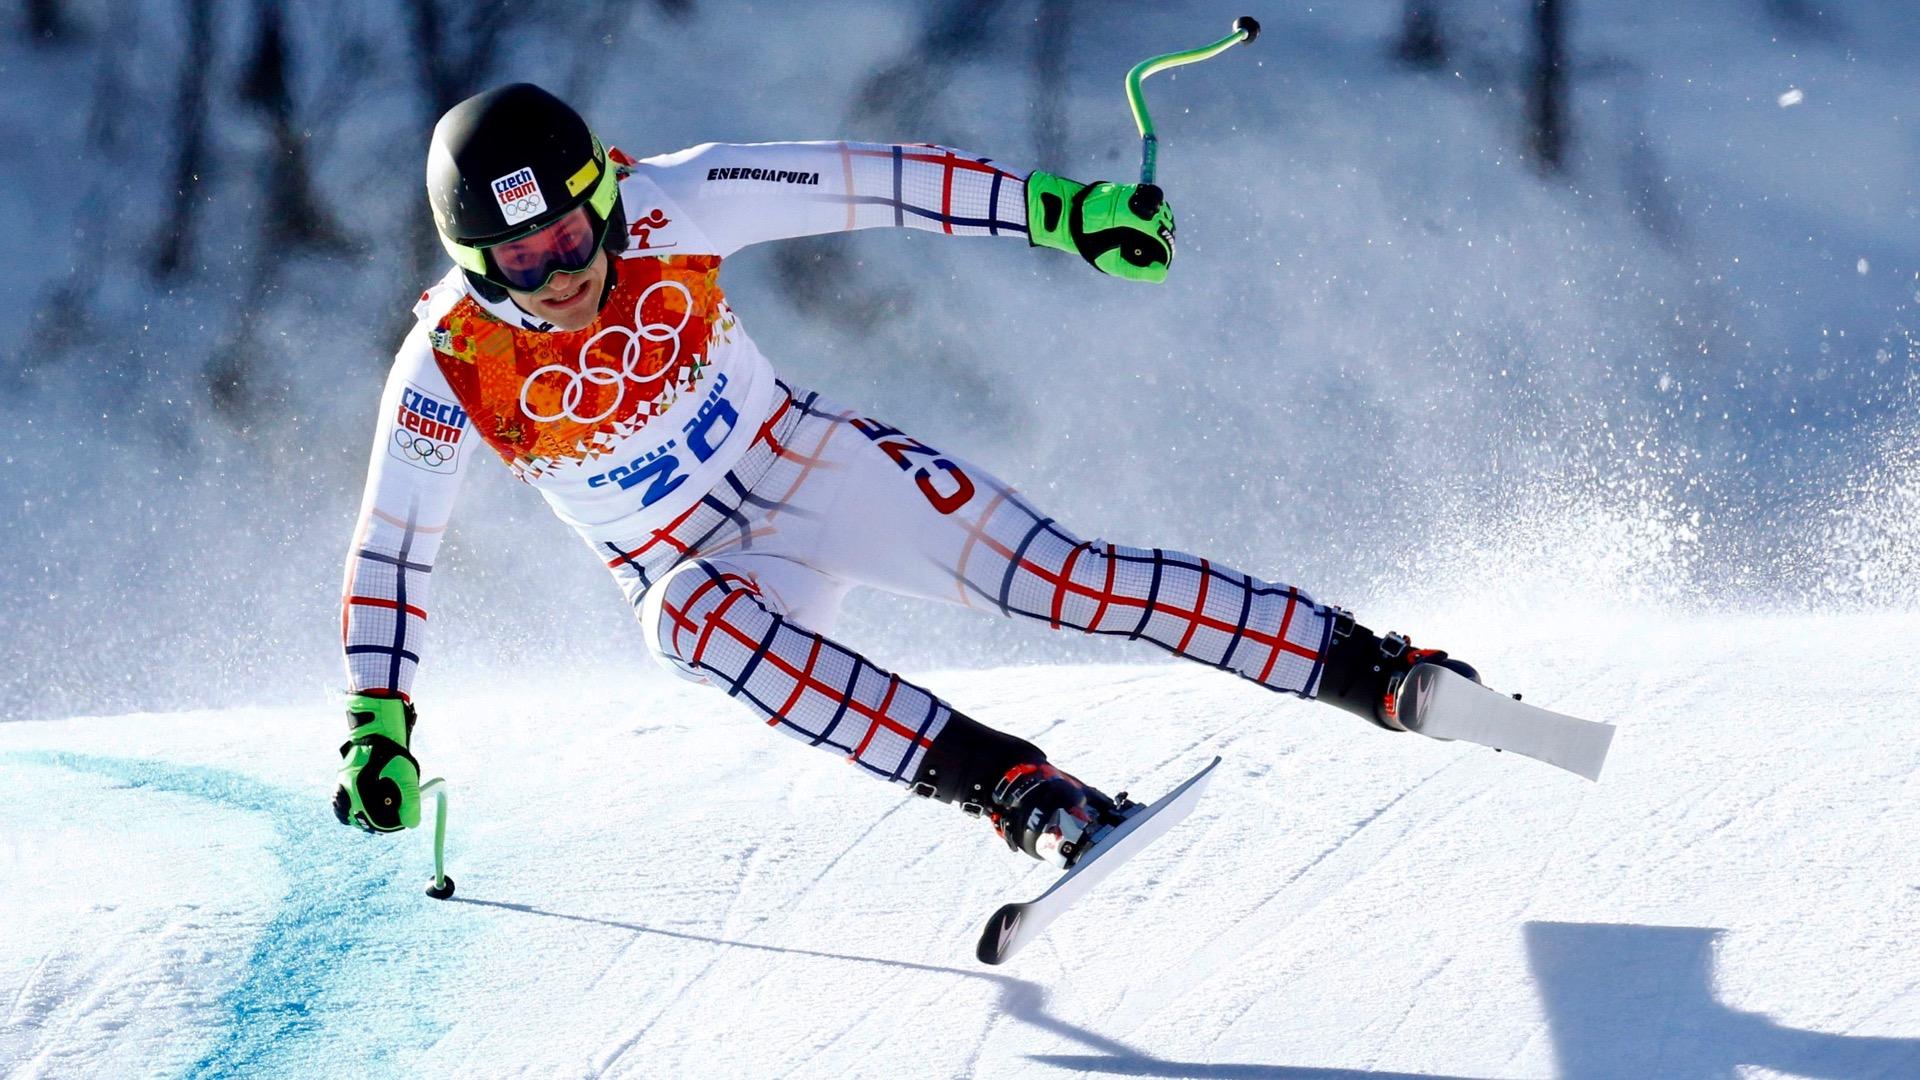 2018 Winter Olympics 18